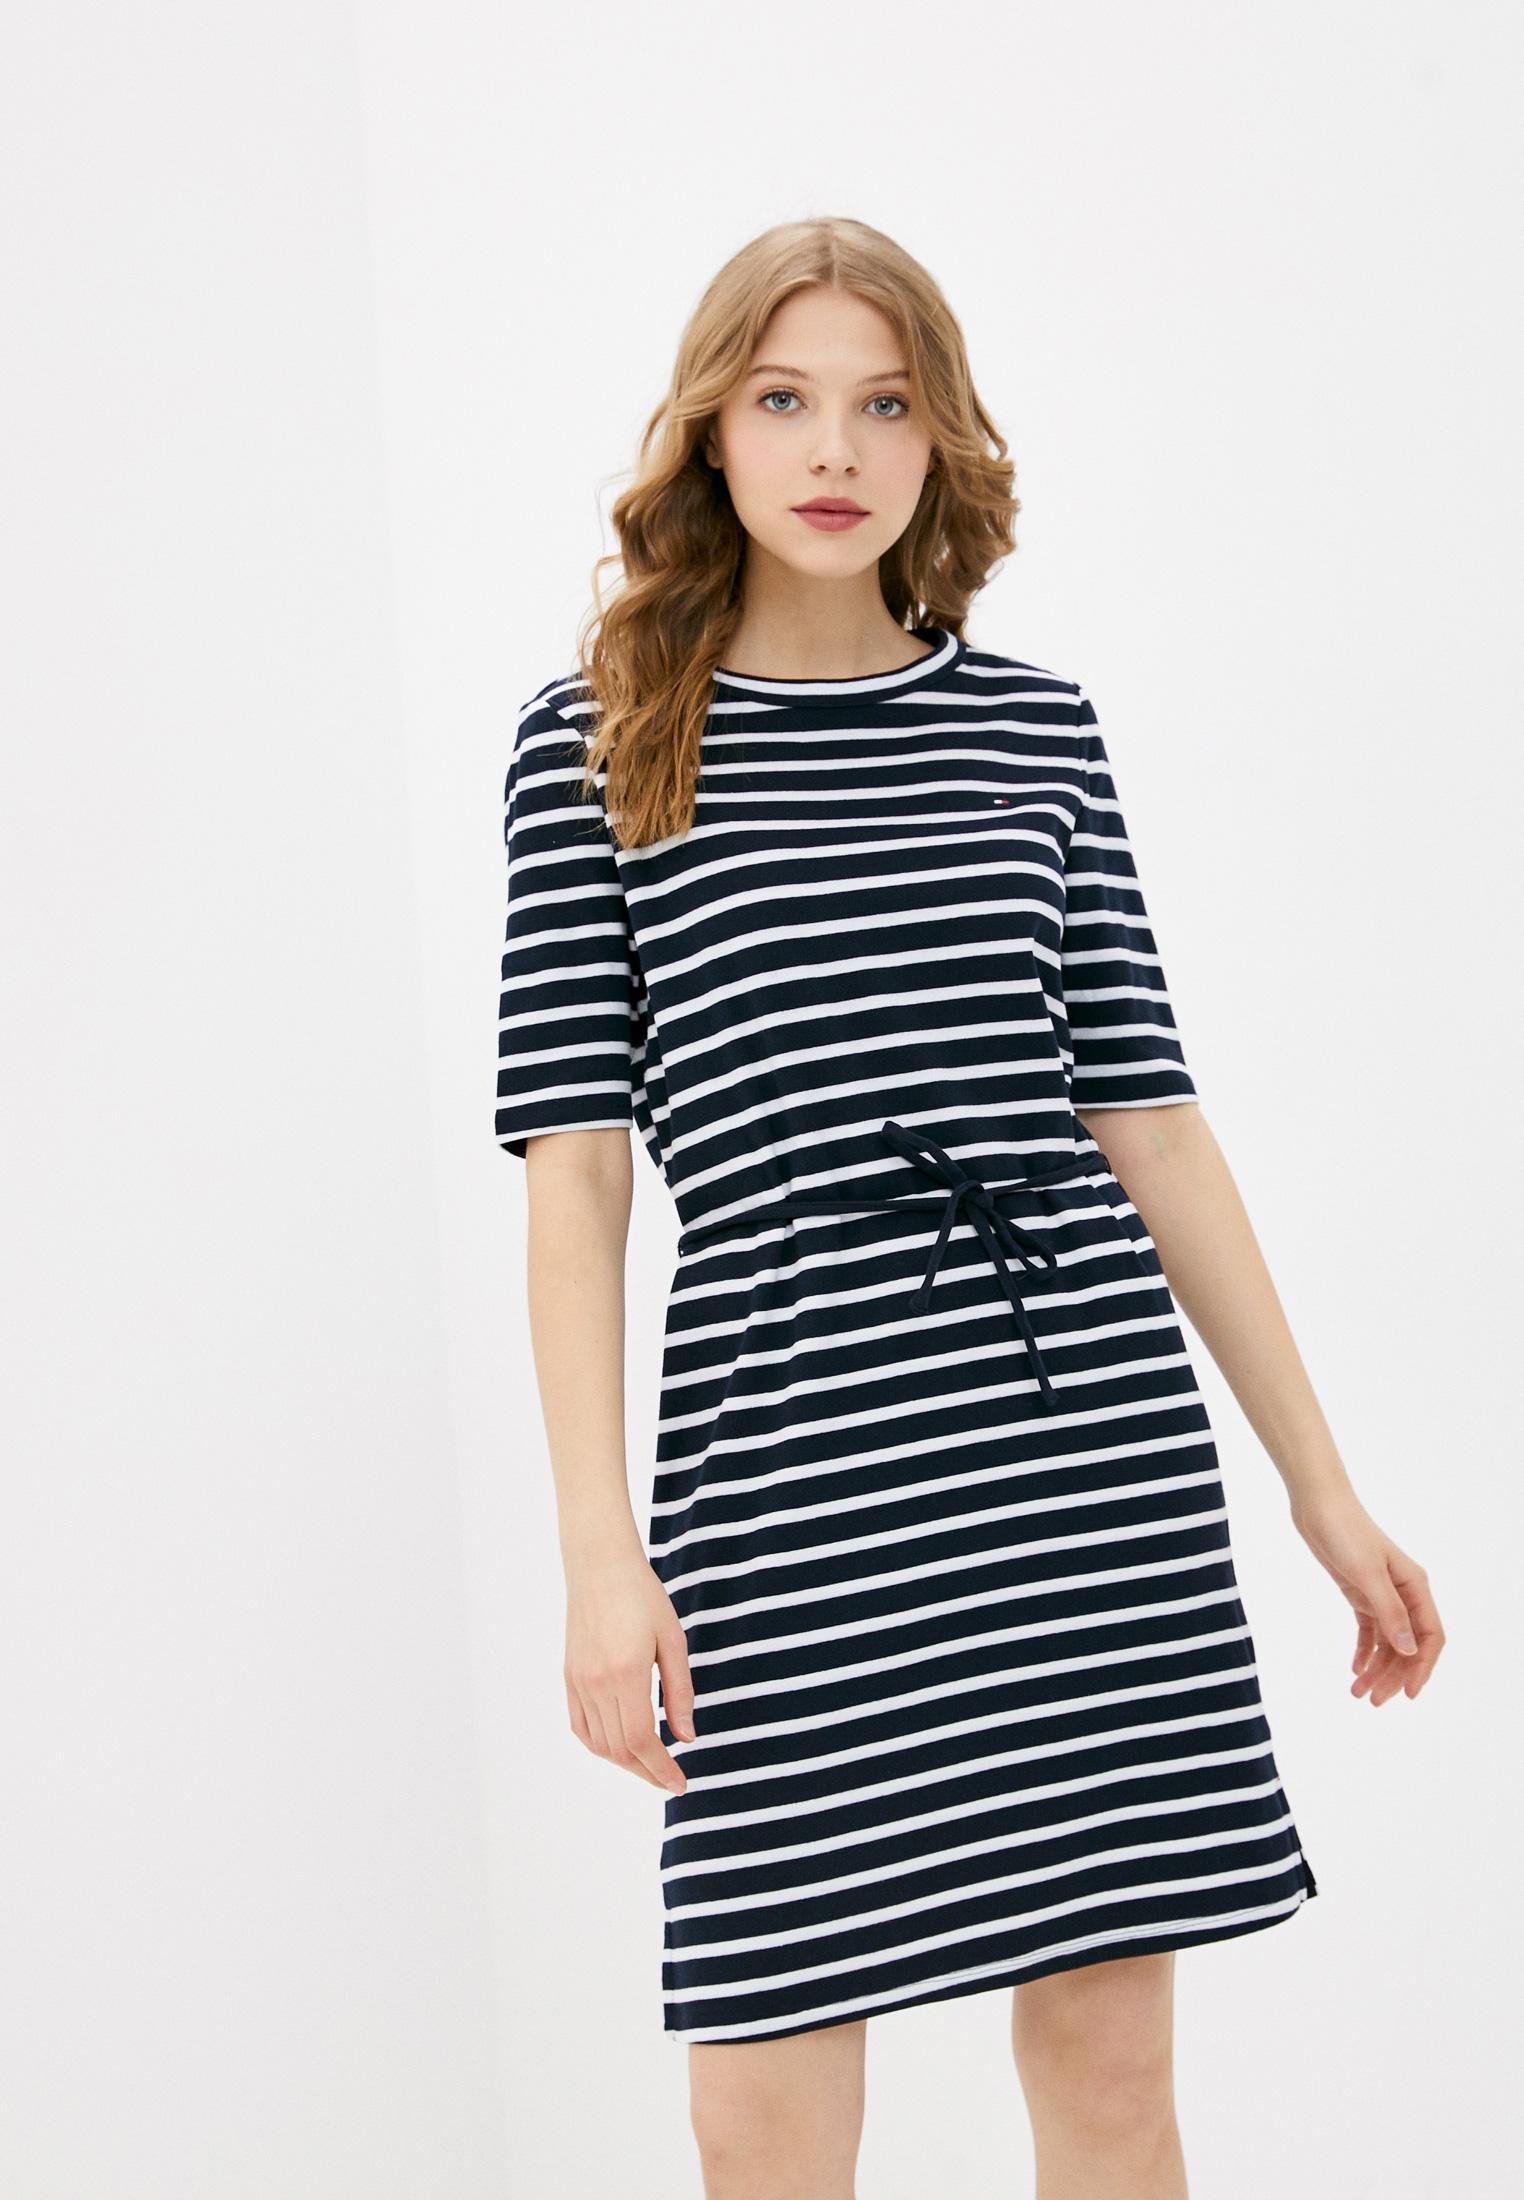 Платье Tommy Hilfiger (Томми Хилфигер) WW0WW30375: изображение 1